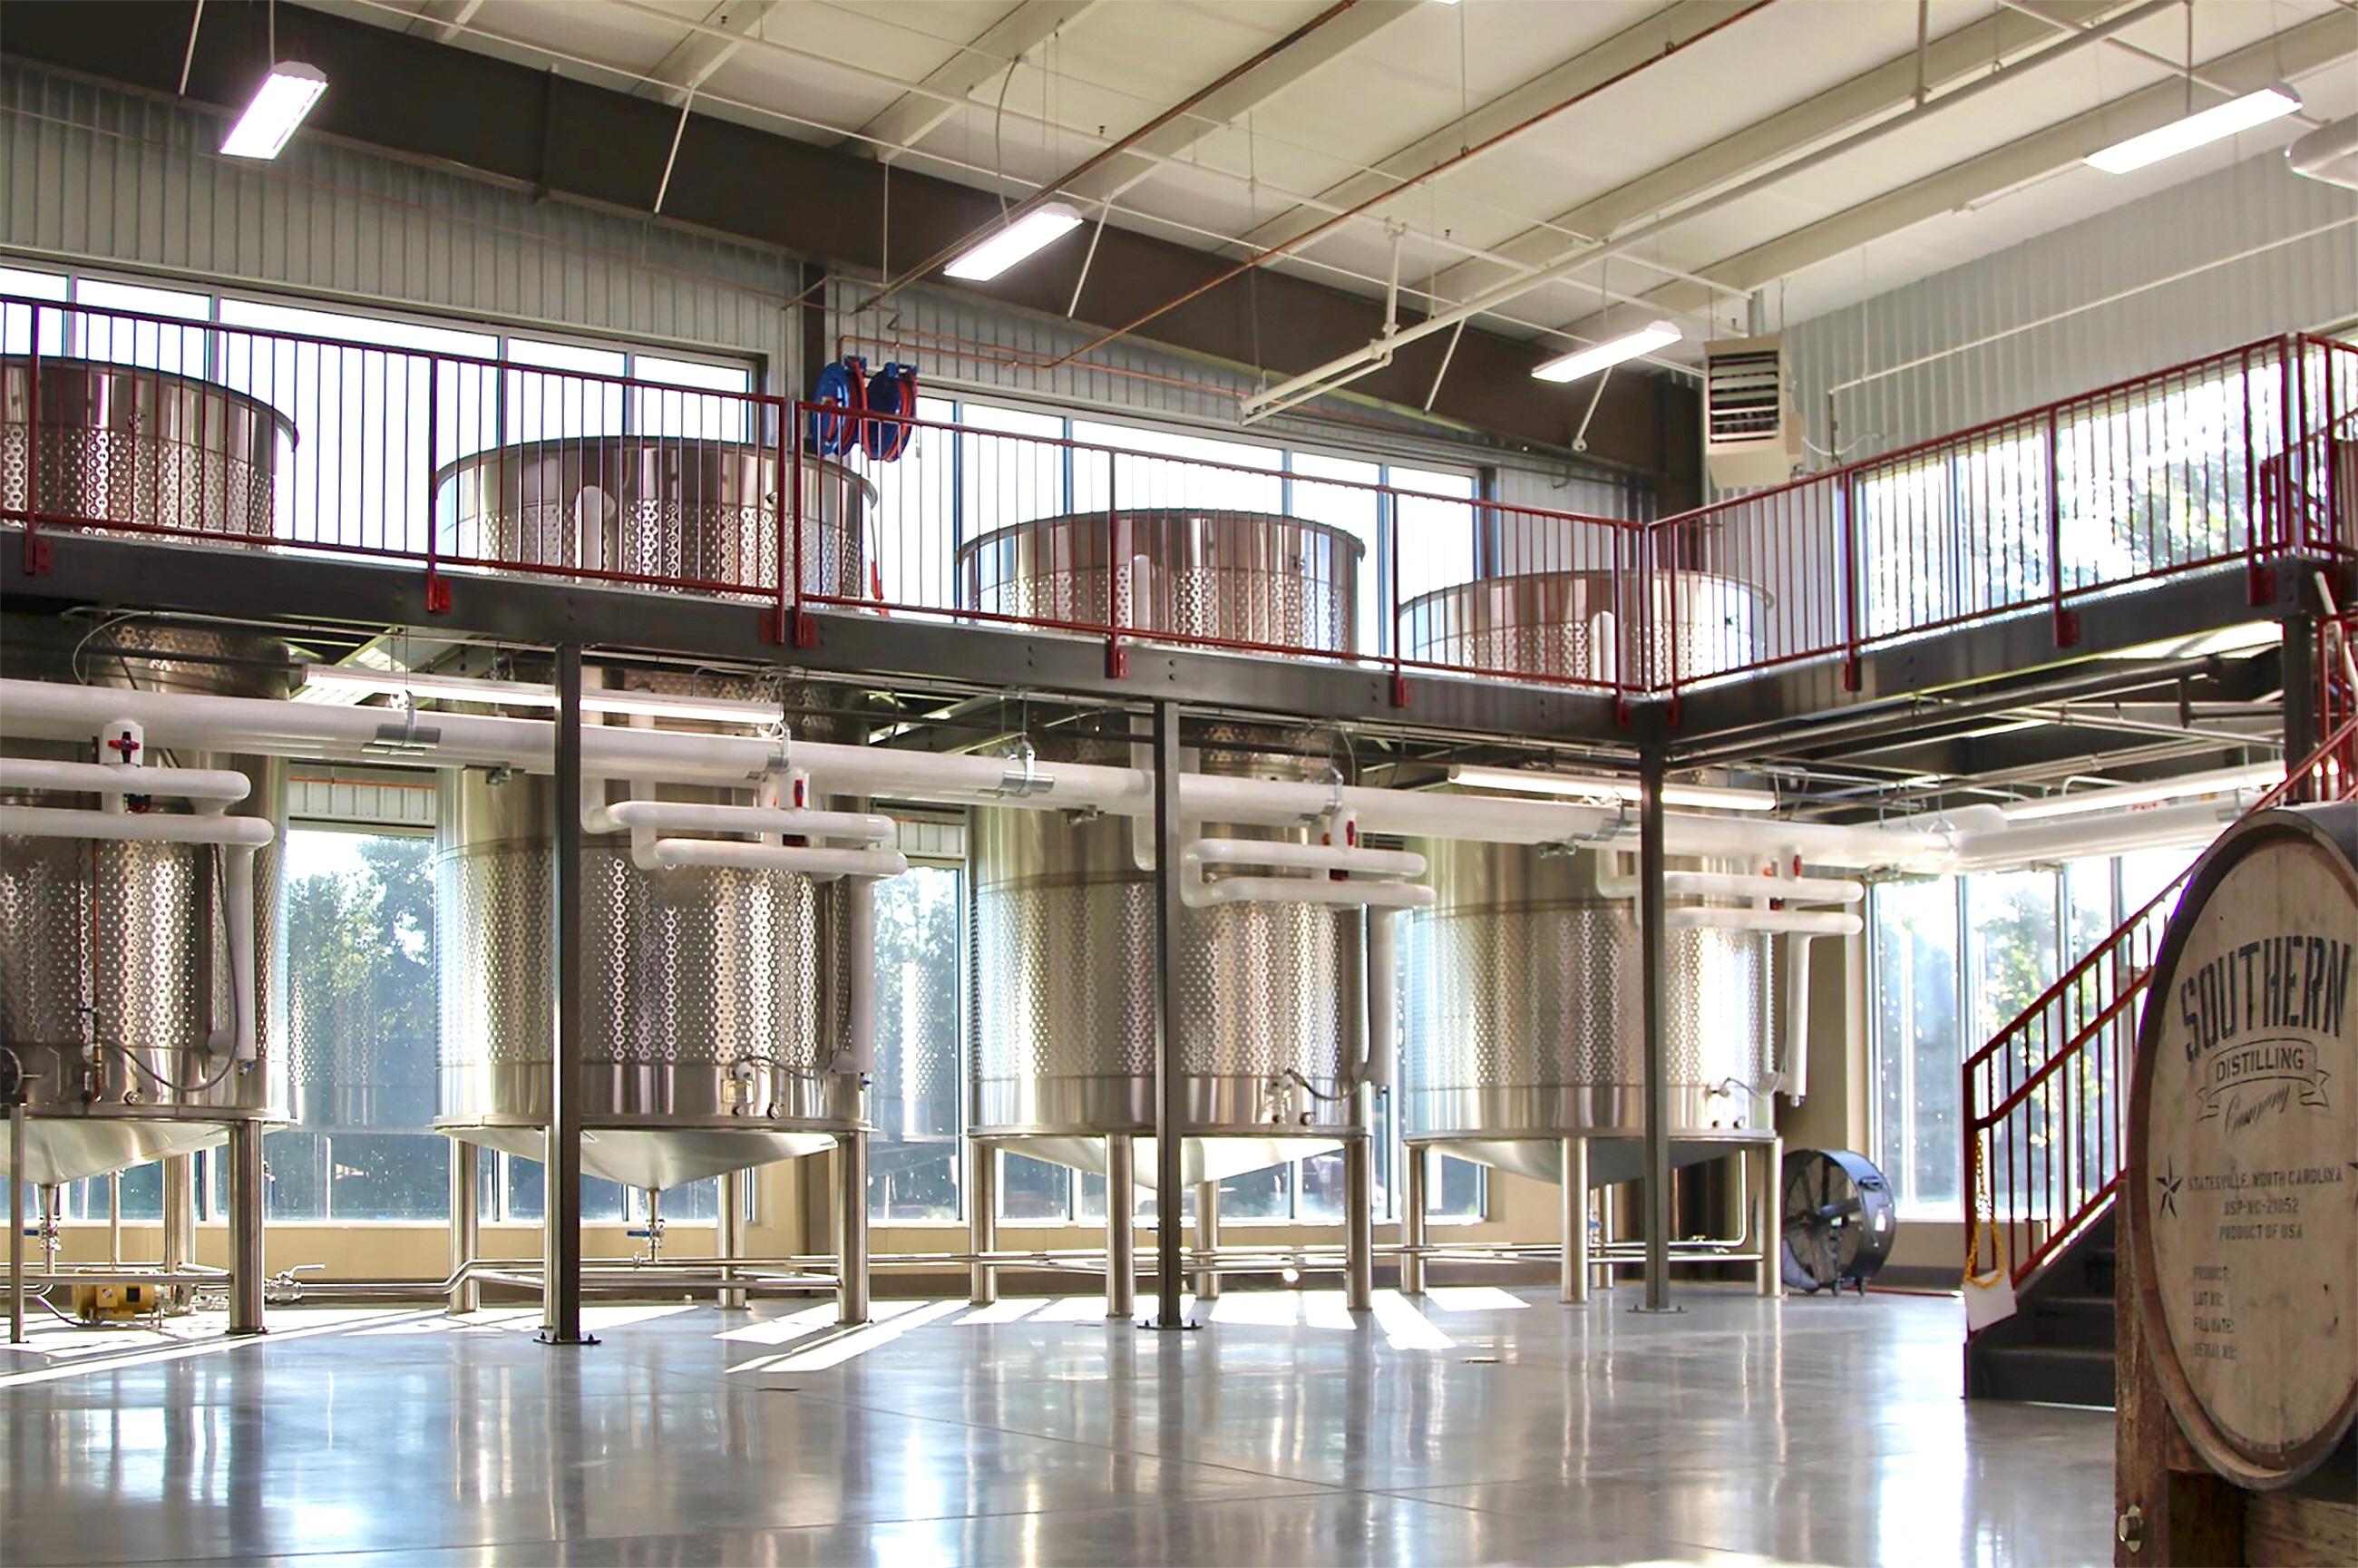 Spokane Industries Distilling Tanks at Southern Distilling